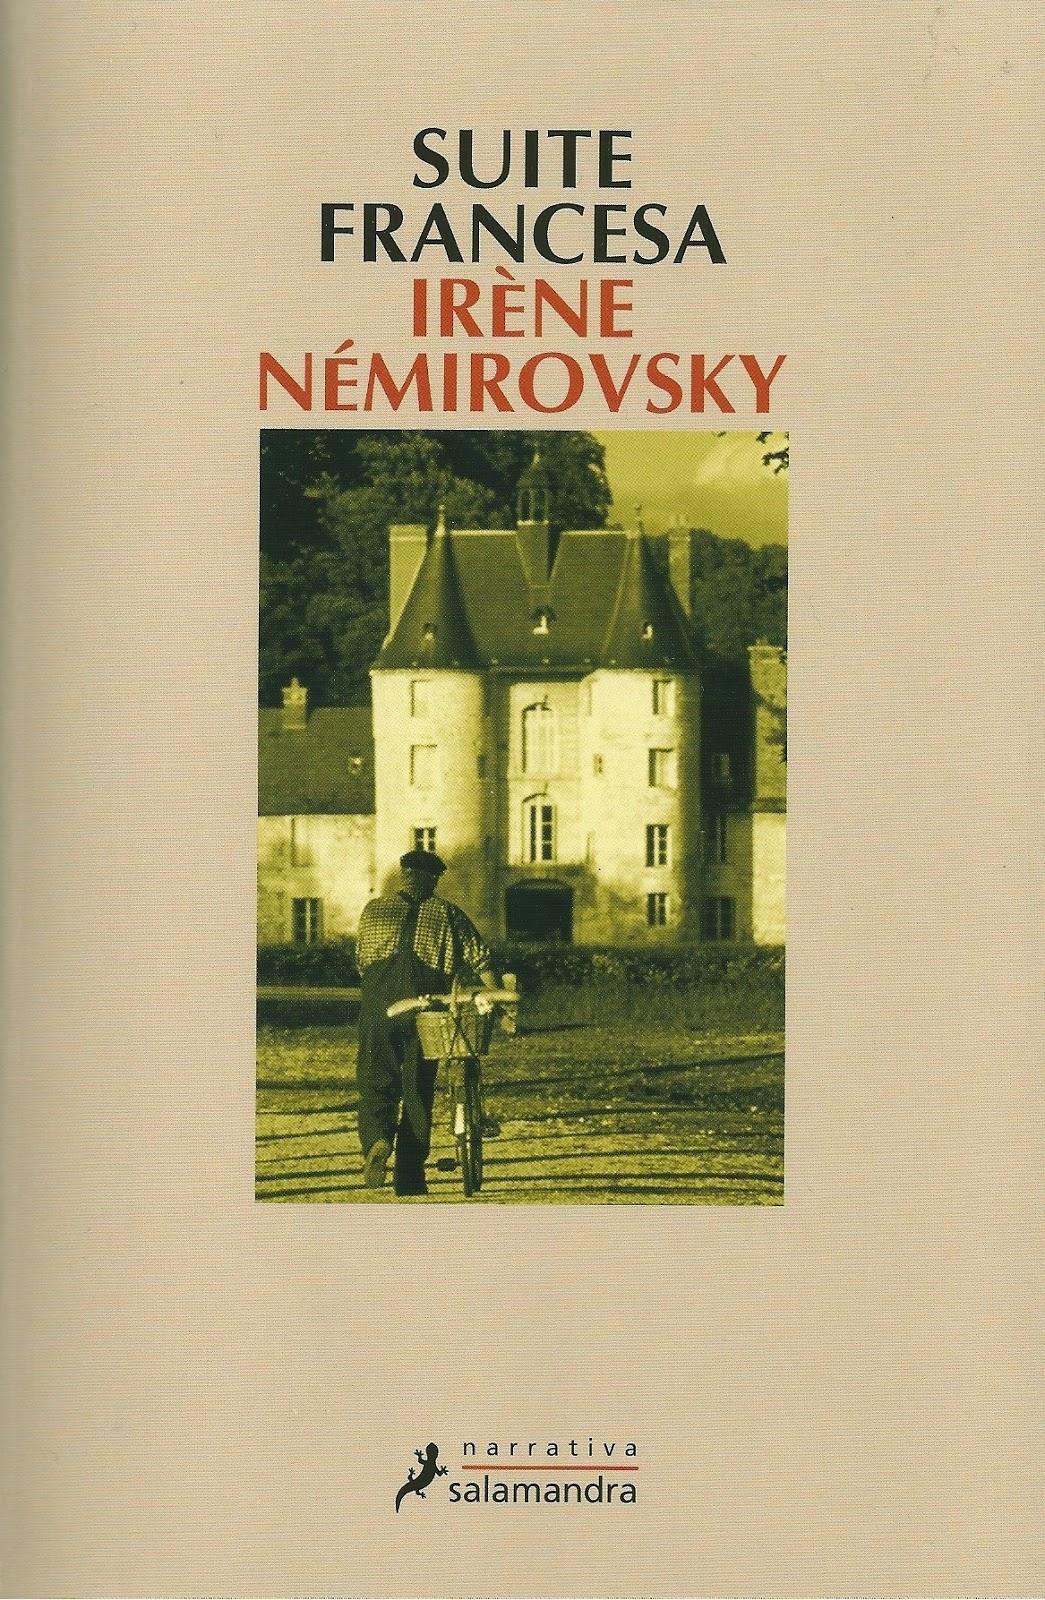 suite-francesa-irene-nemirowsky